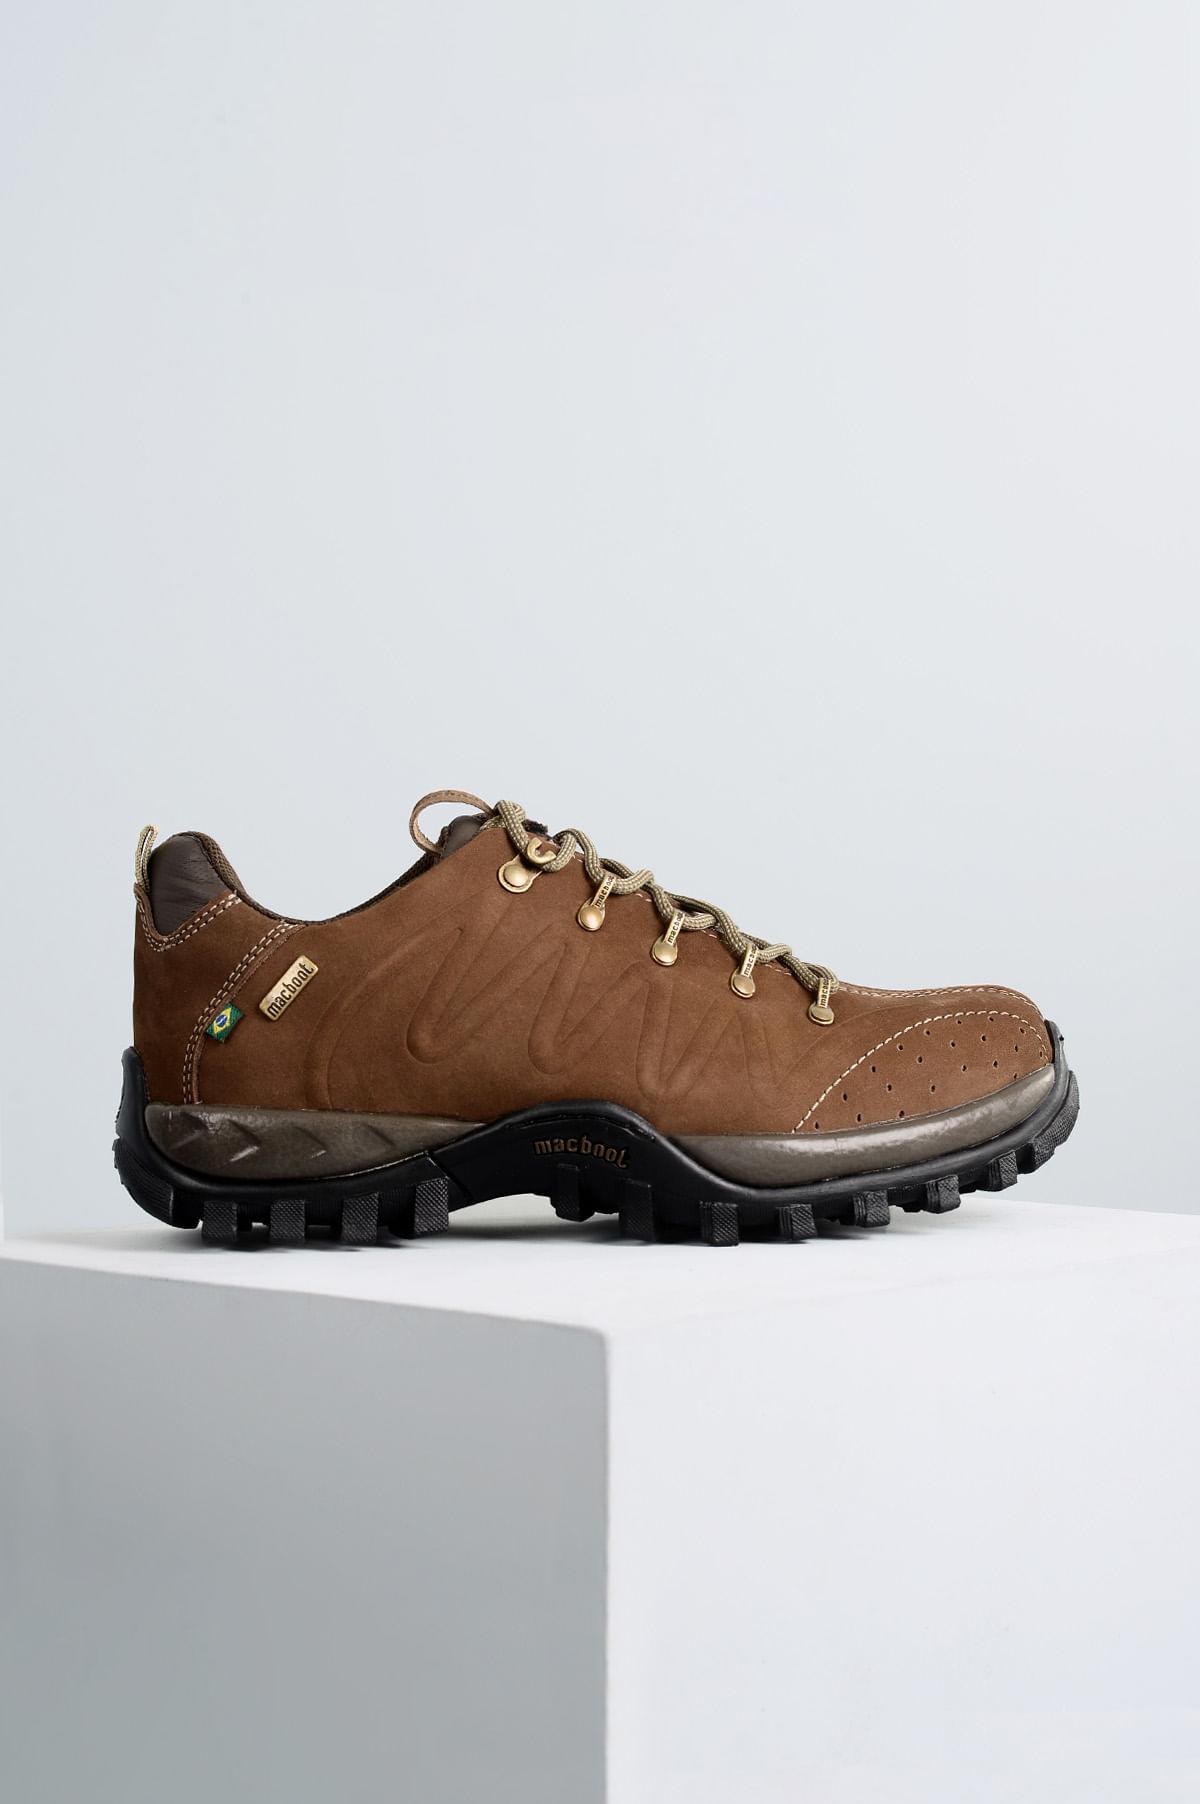 b0a1354658e291 Bota Masculina Mac Boot Trujilo CR-WHISK - Mundial Calçados